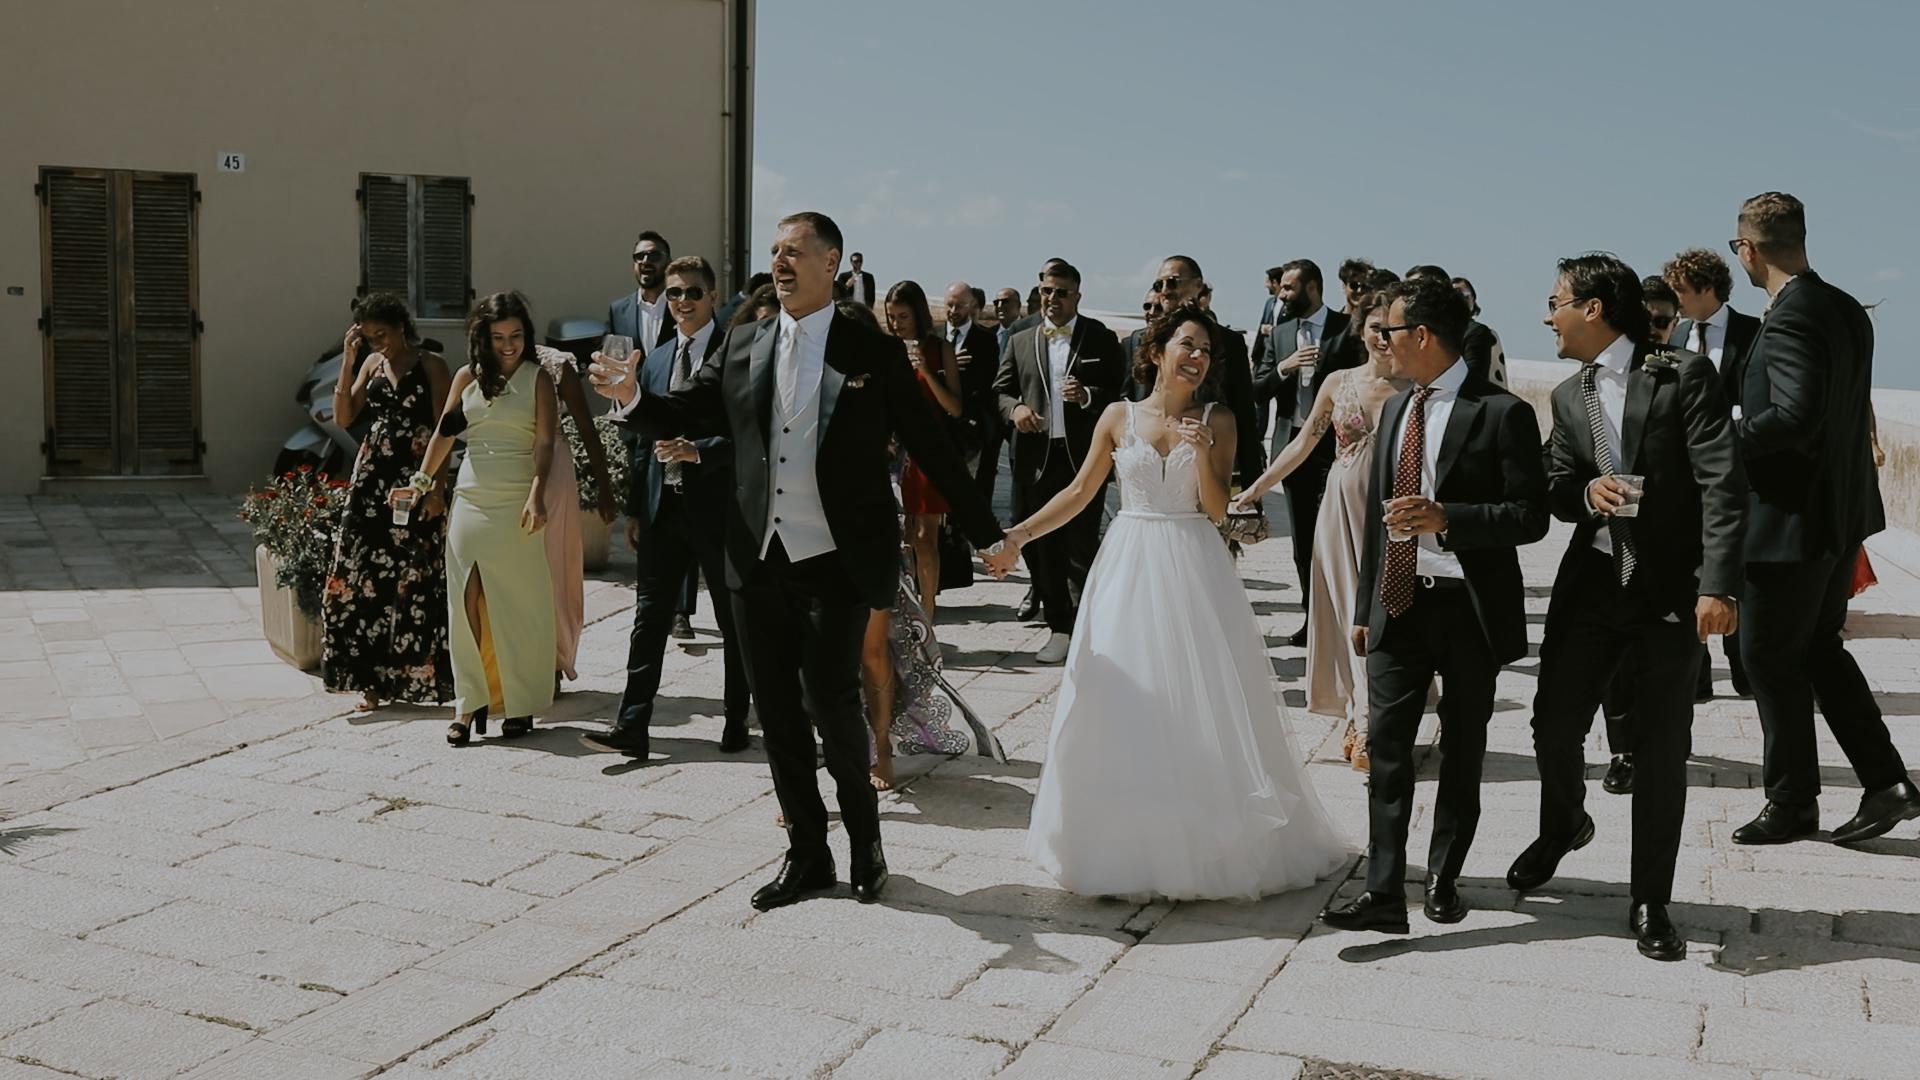 FILM.00_02_32_00.Immagine007 Matrimonio a Termoli